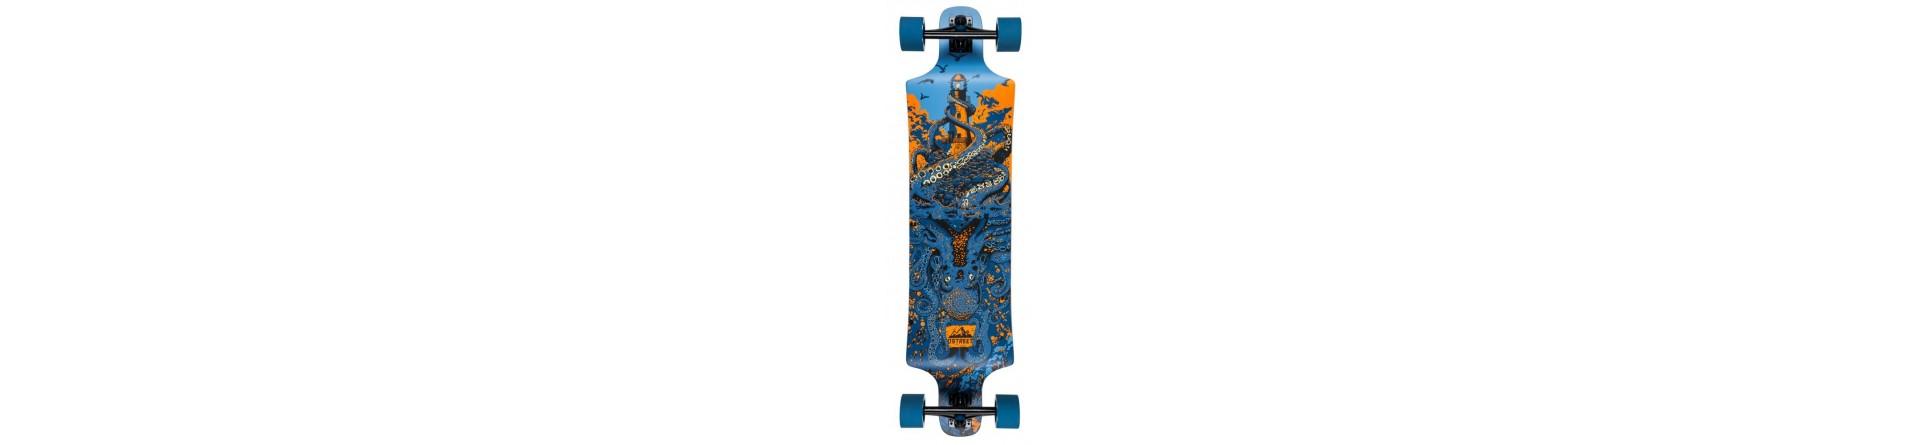 Skate | Giuglar Shop